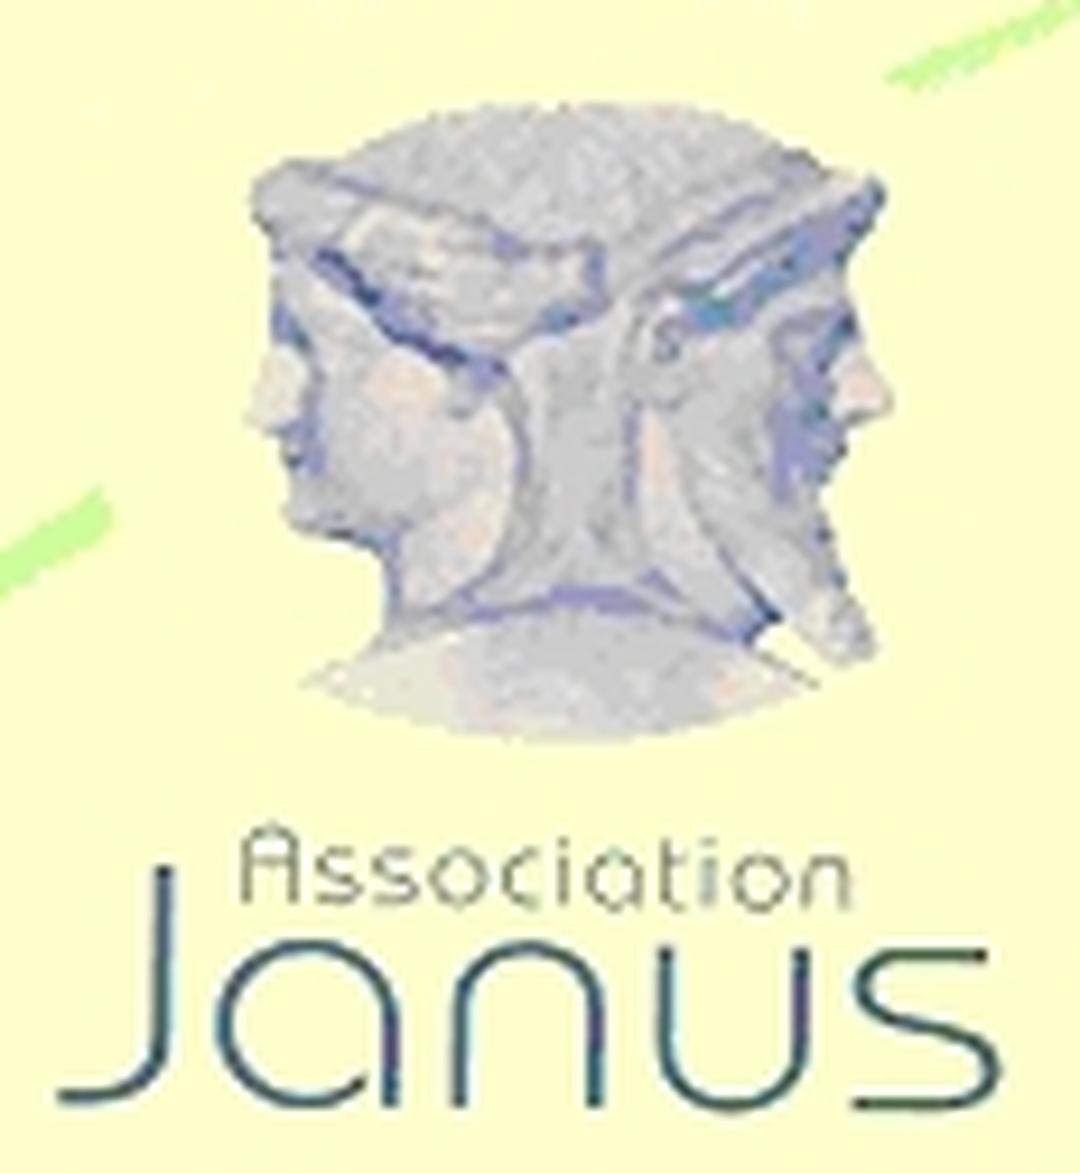 Photo of the February 5, 2016 6:48 PM, Association Janus, Lincel, 04870 Saint-Michel-l'Observatoire, France